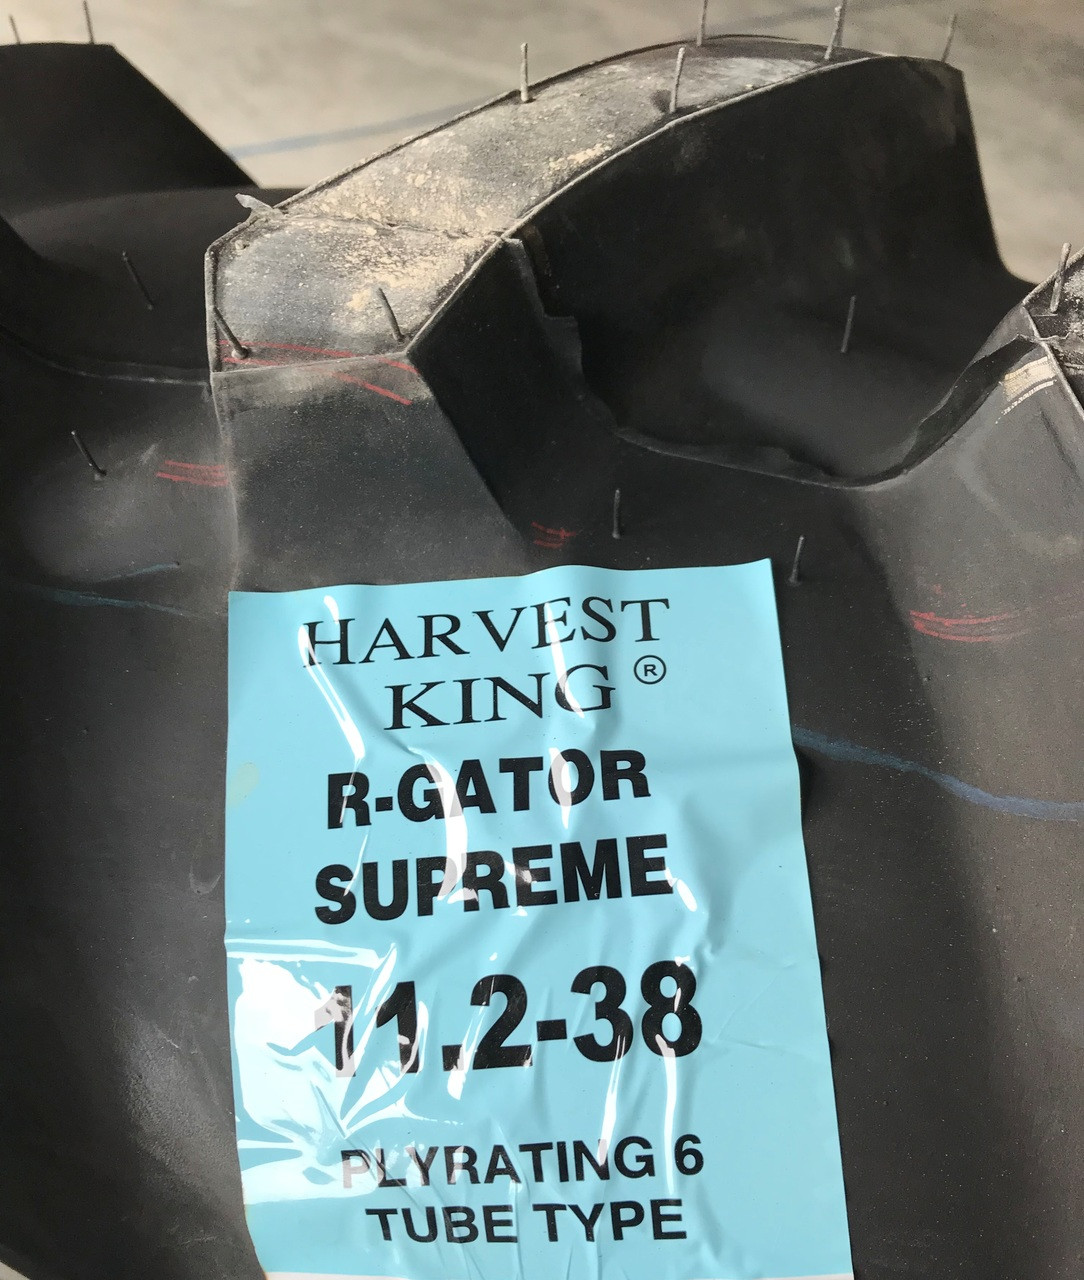 38 Harvest King R-Gator II Industrial Tire 11.2//